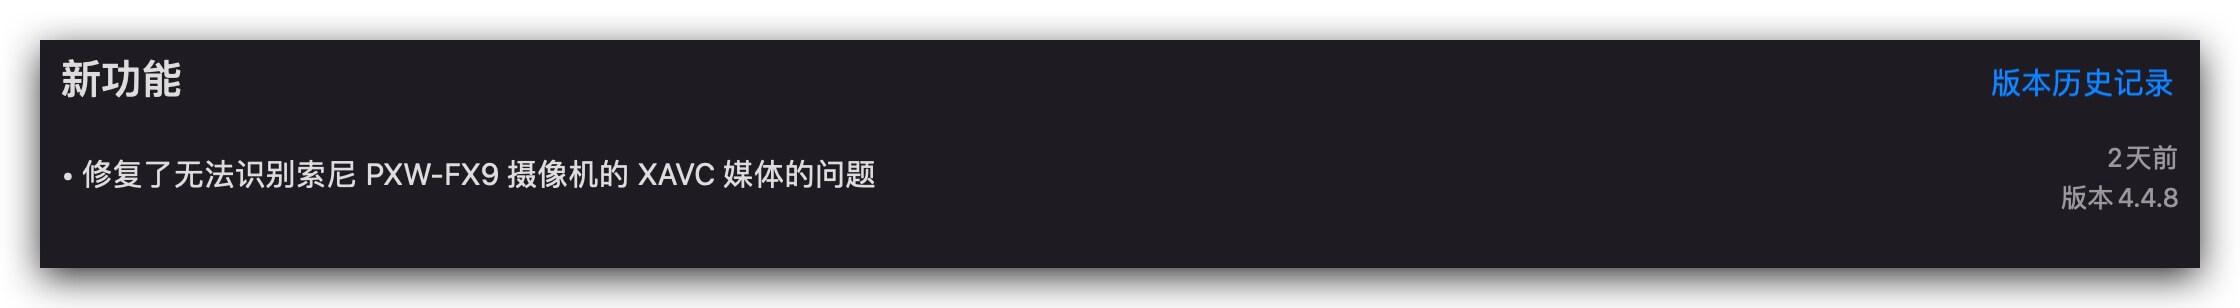 Apple Compressor 4.4.8 破解版免费下载 中英文版 苹果视频压缩编码转码输出软件